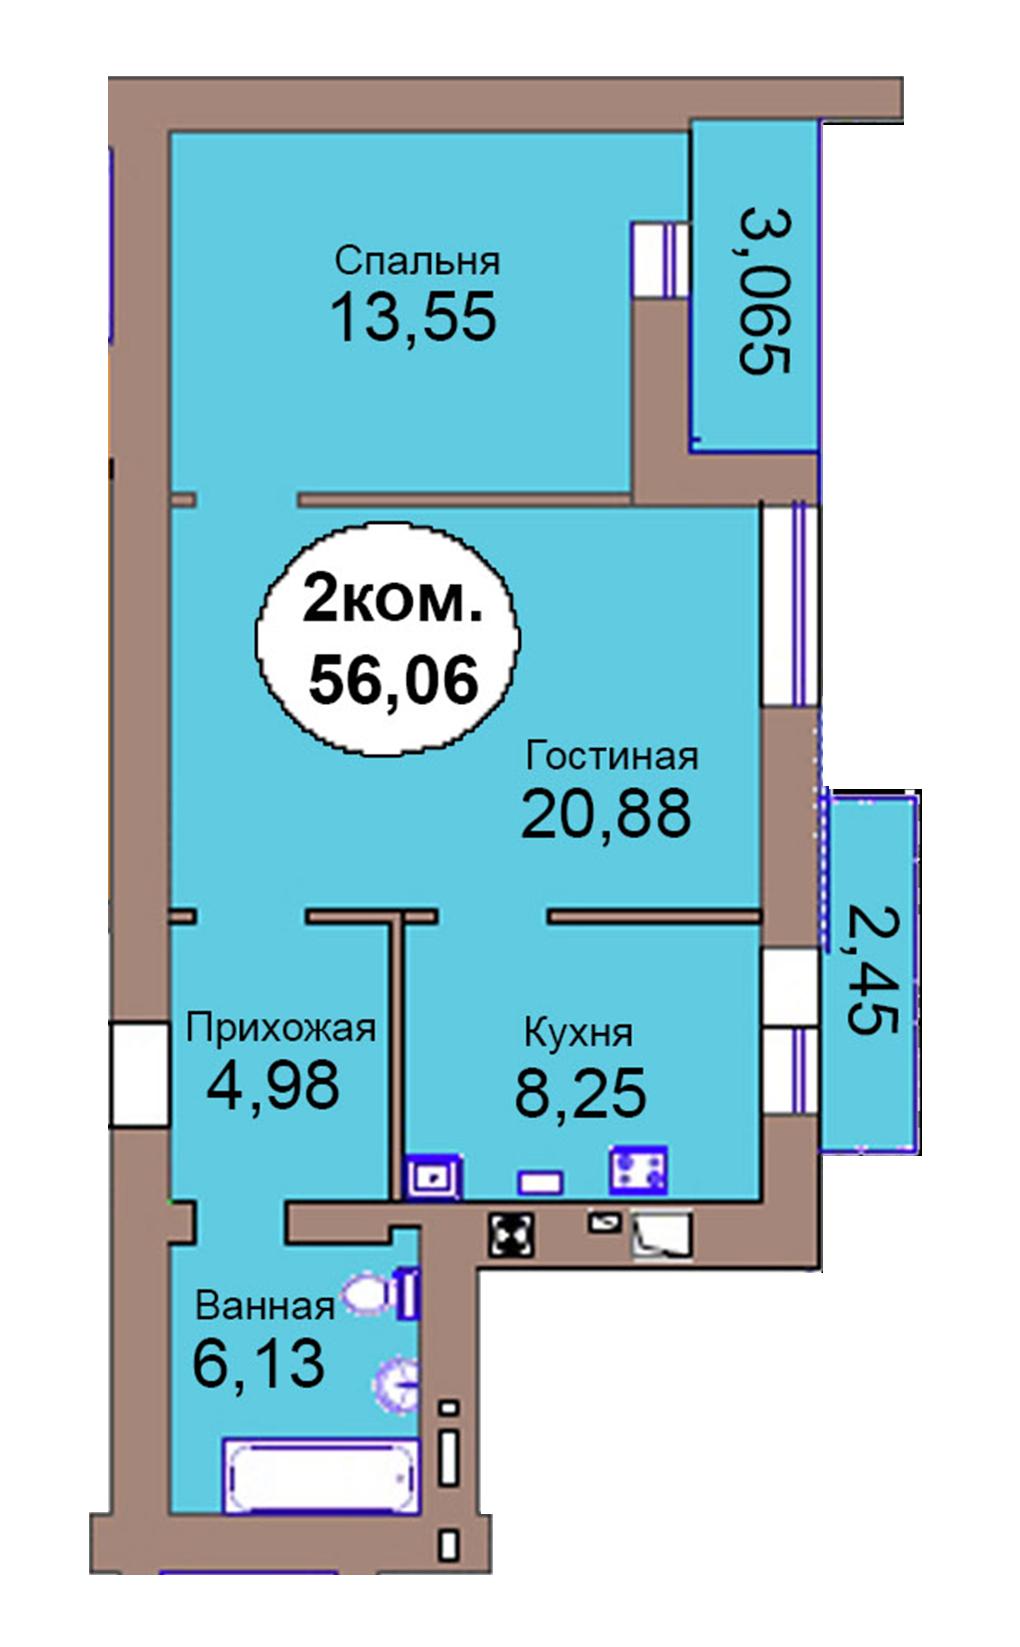 2-комн. кв. по пер. Калининградский, 4  кв. 132 в Калининграде